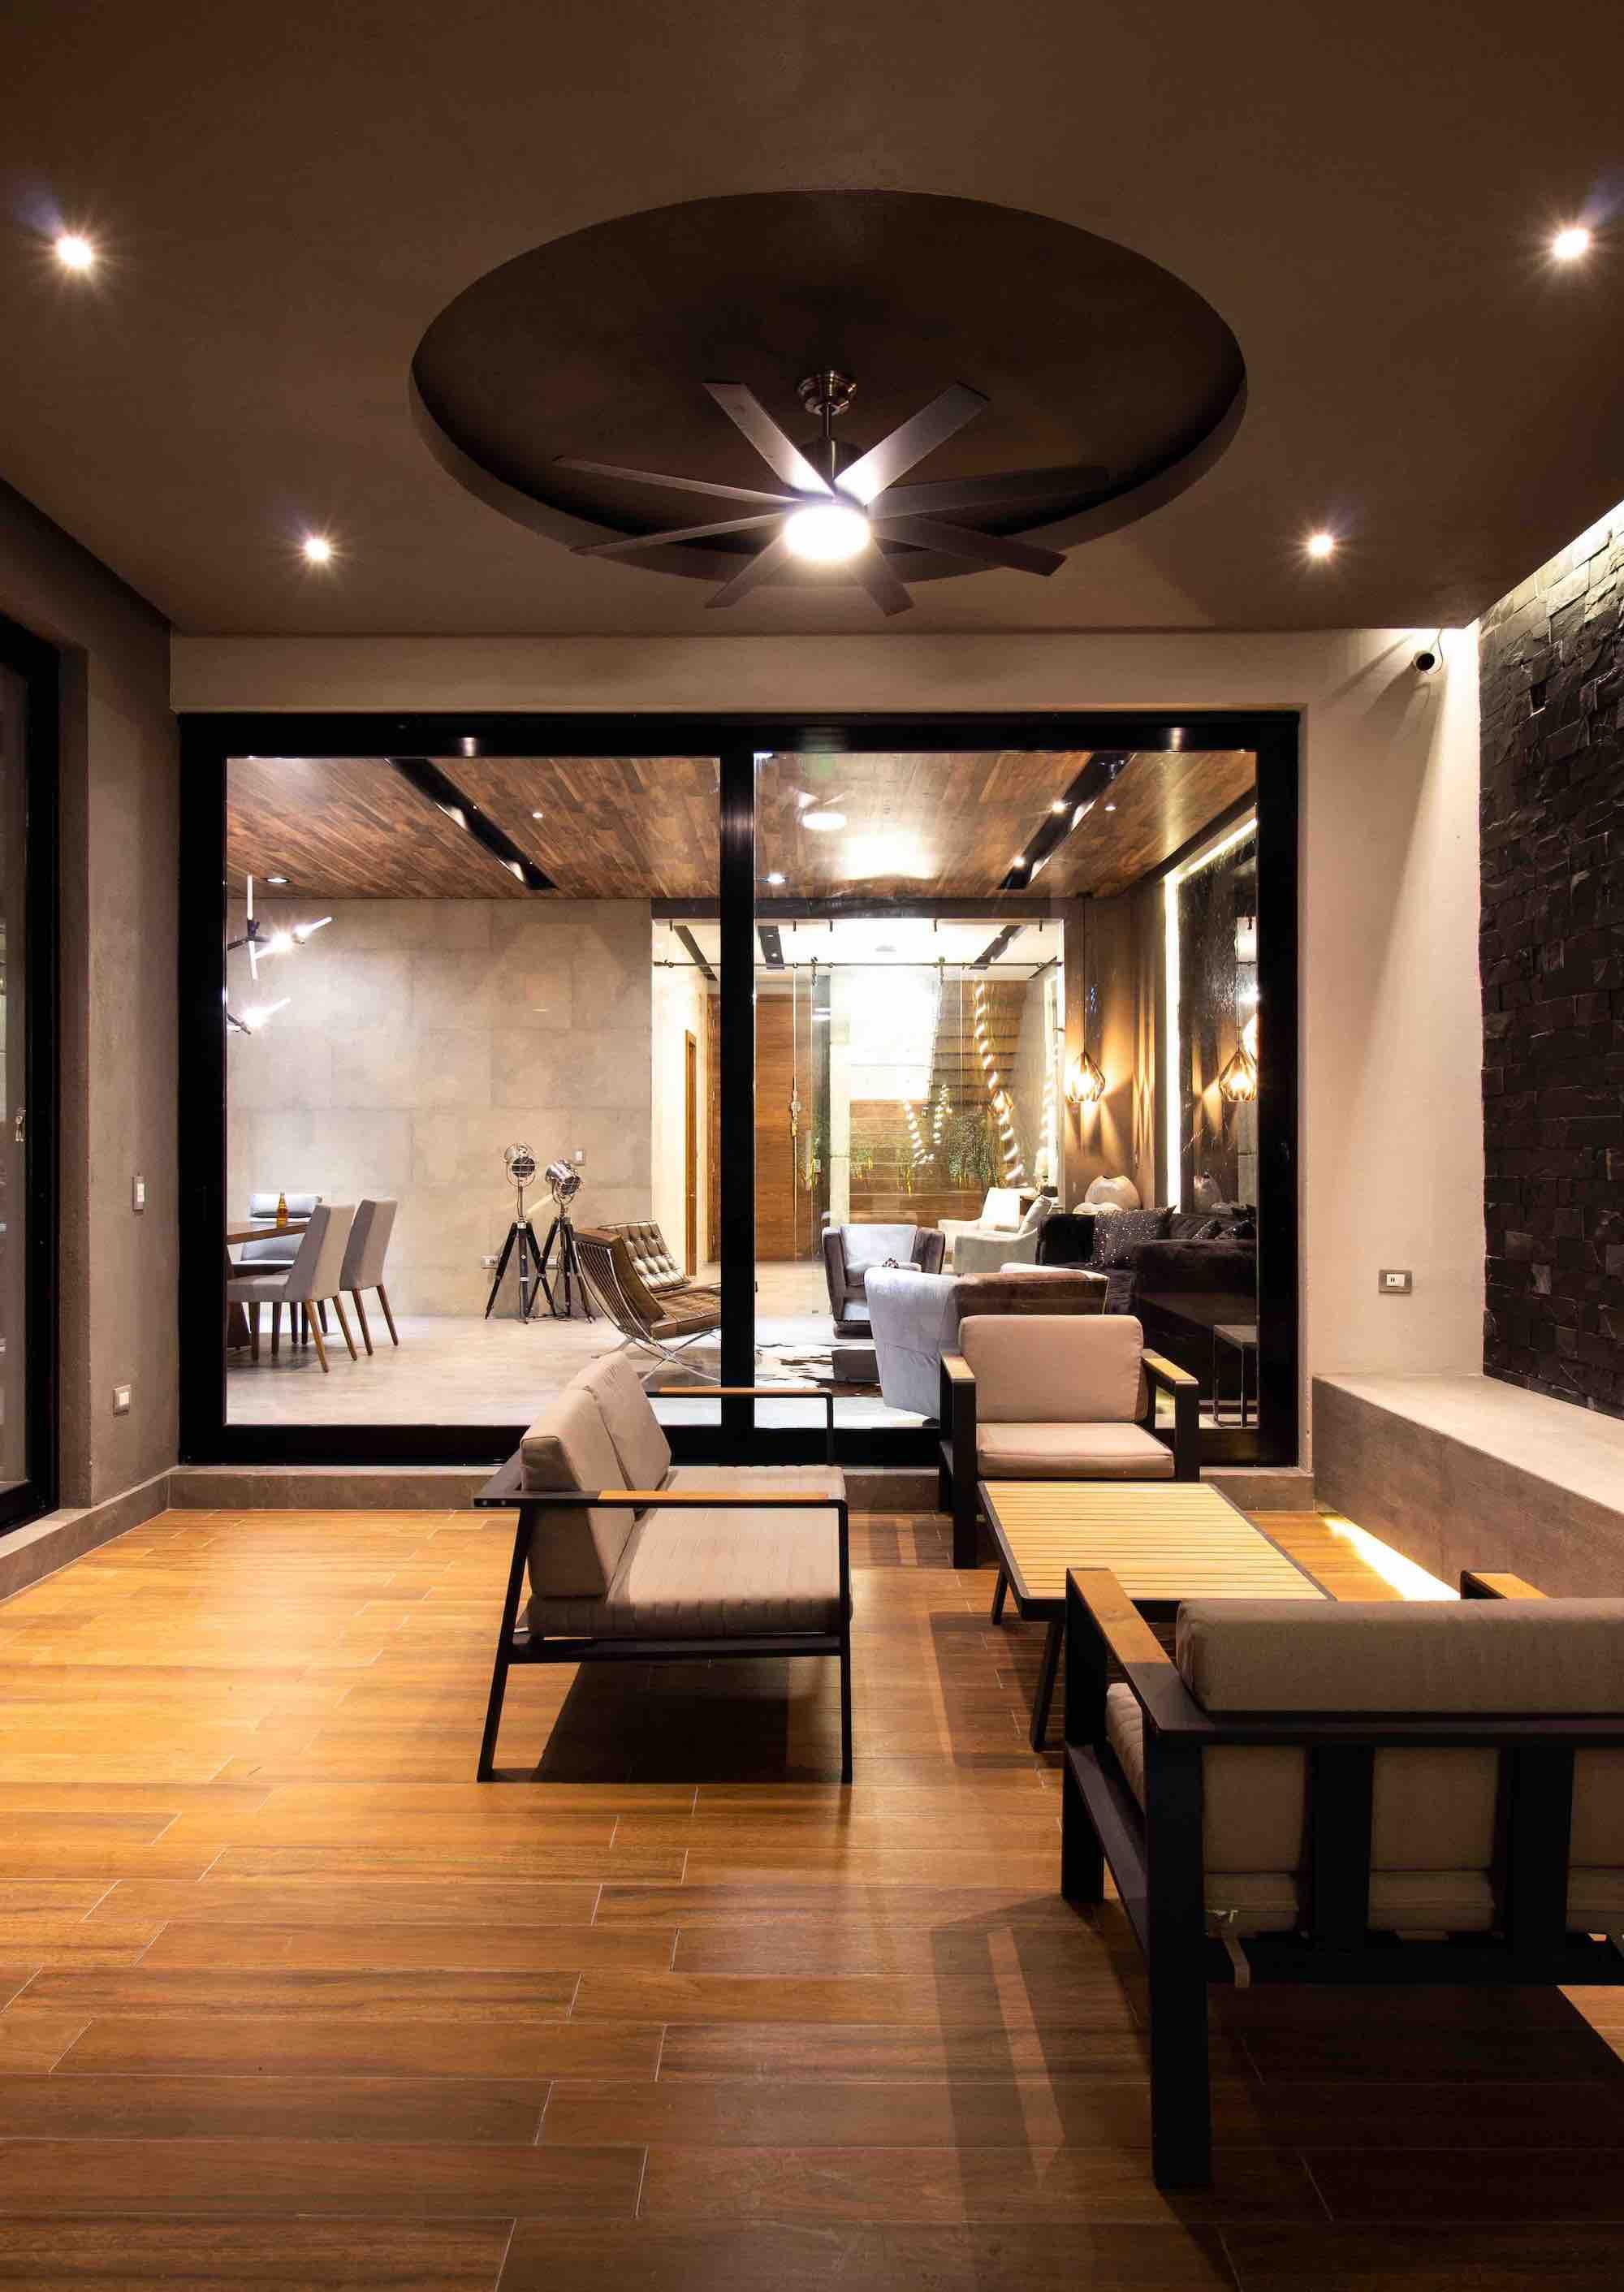 GR_House_Gallardo_arquitectura_amazingarchitecture_mexico_015.jpg